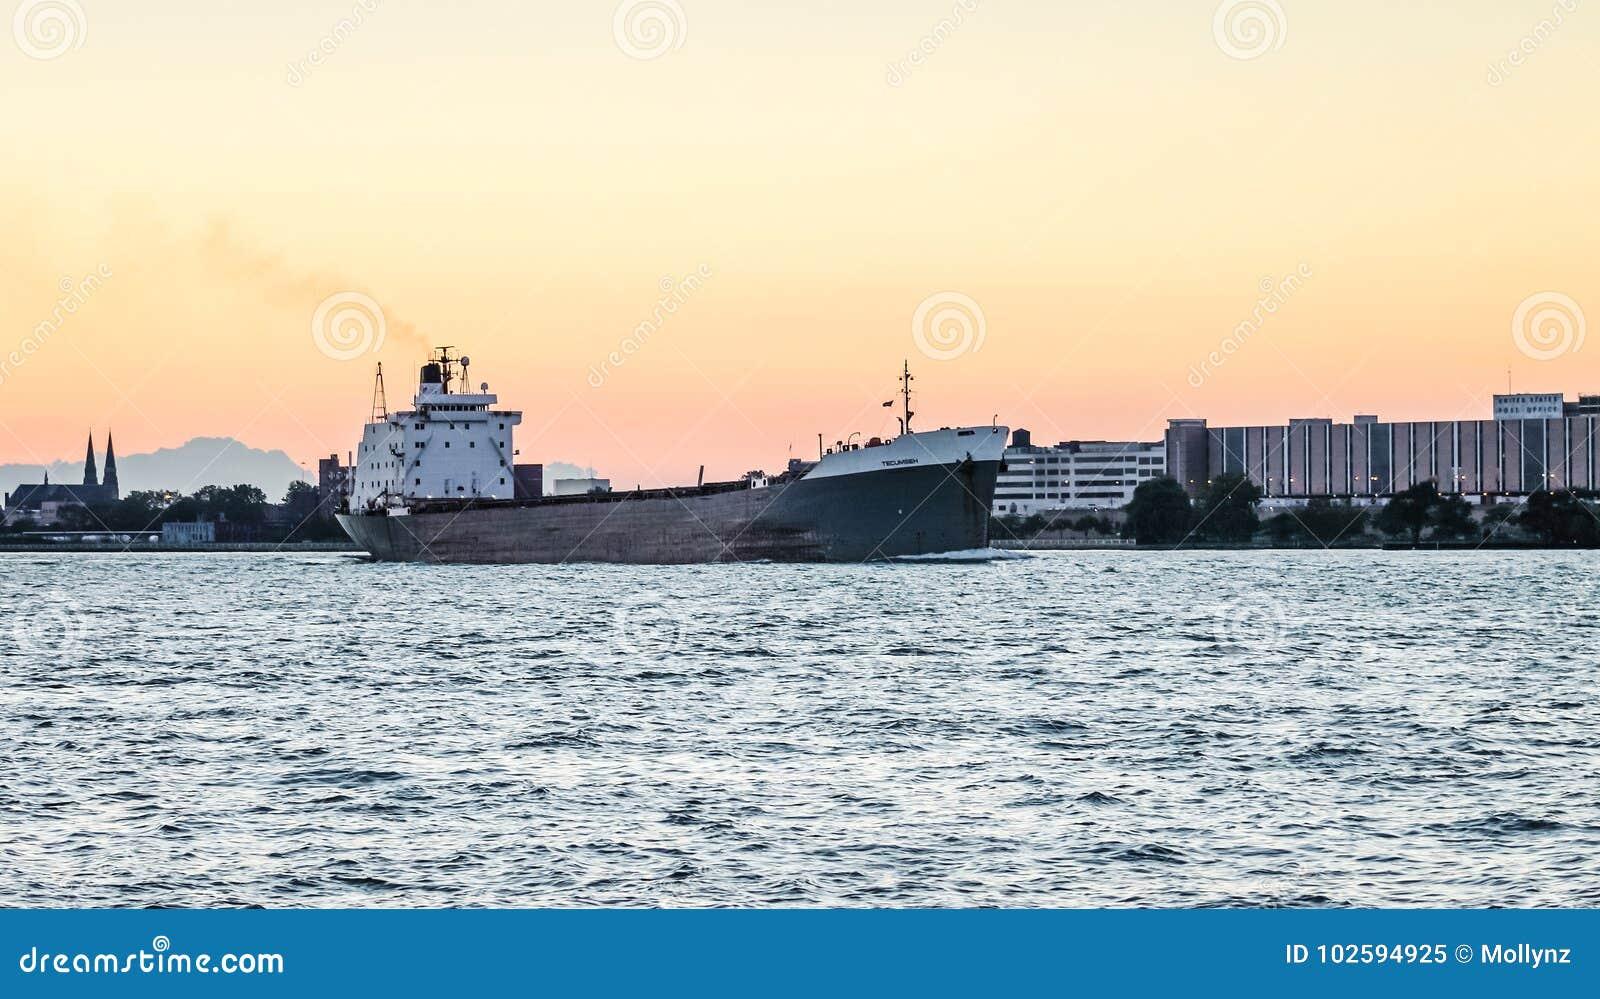 The TECUMSEH Bulk Carrier ship on the Detroit River